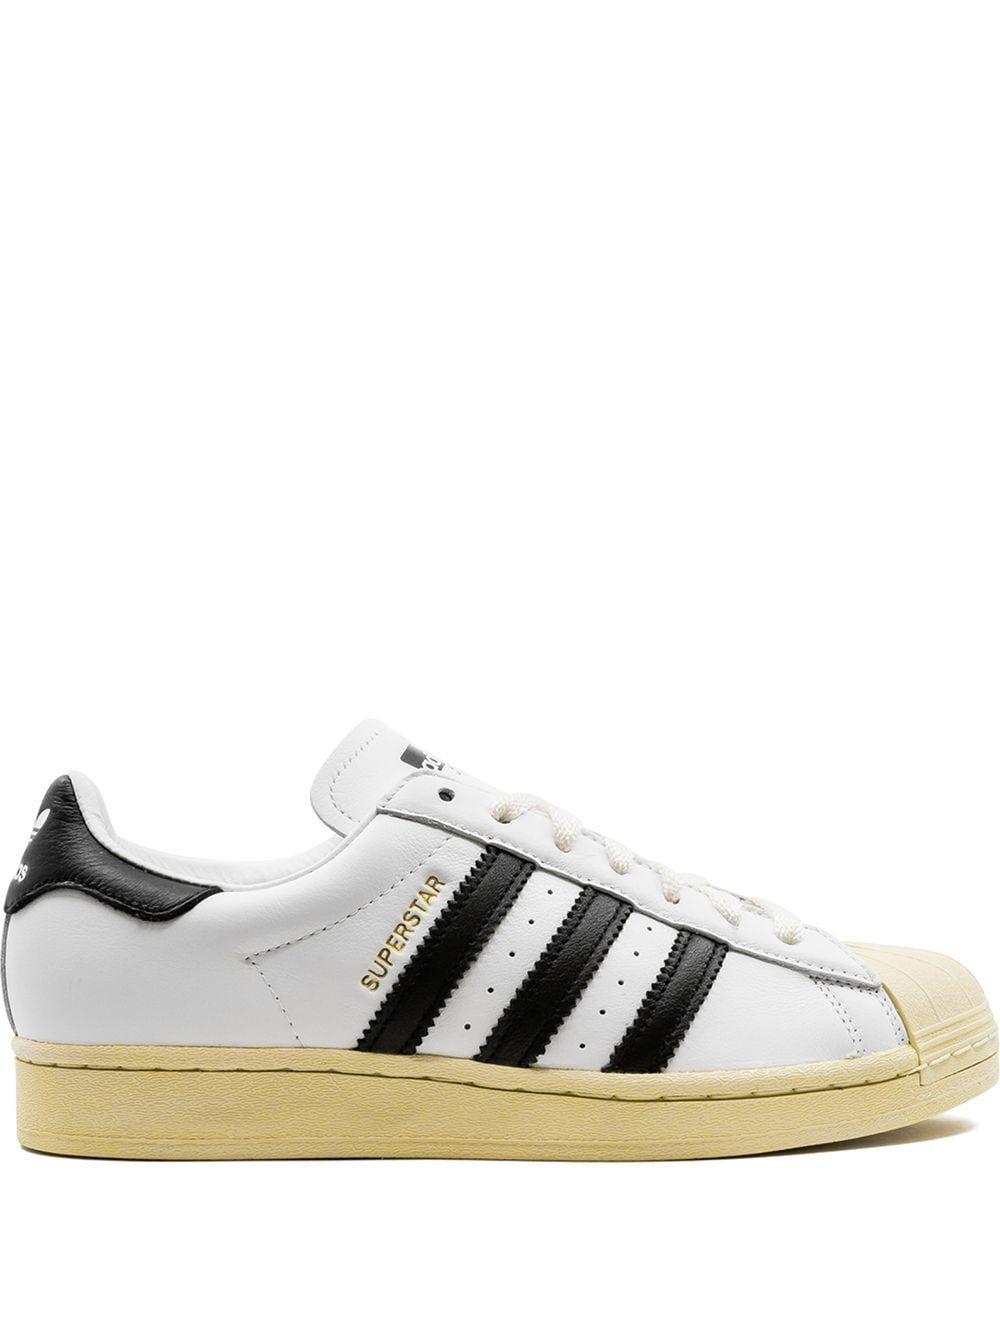 Adidas sneakers bianco